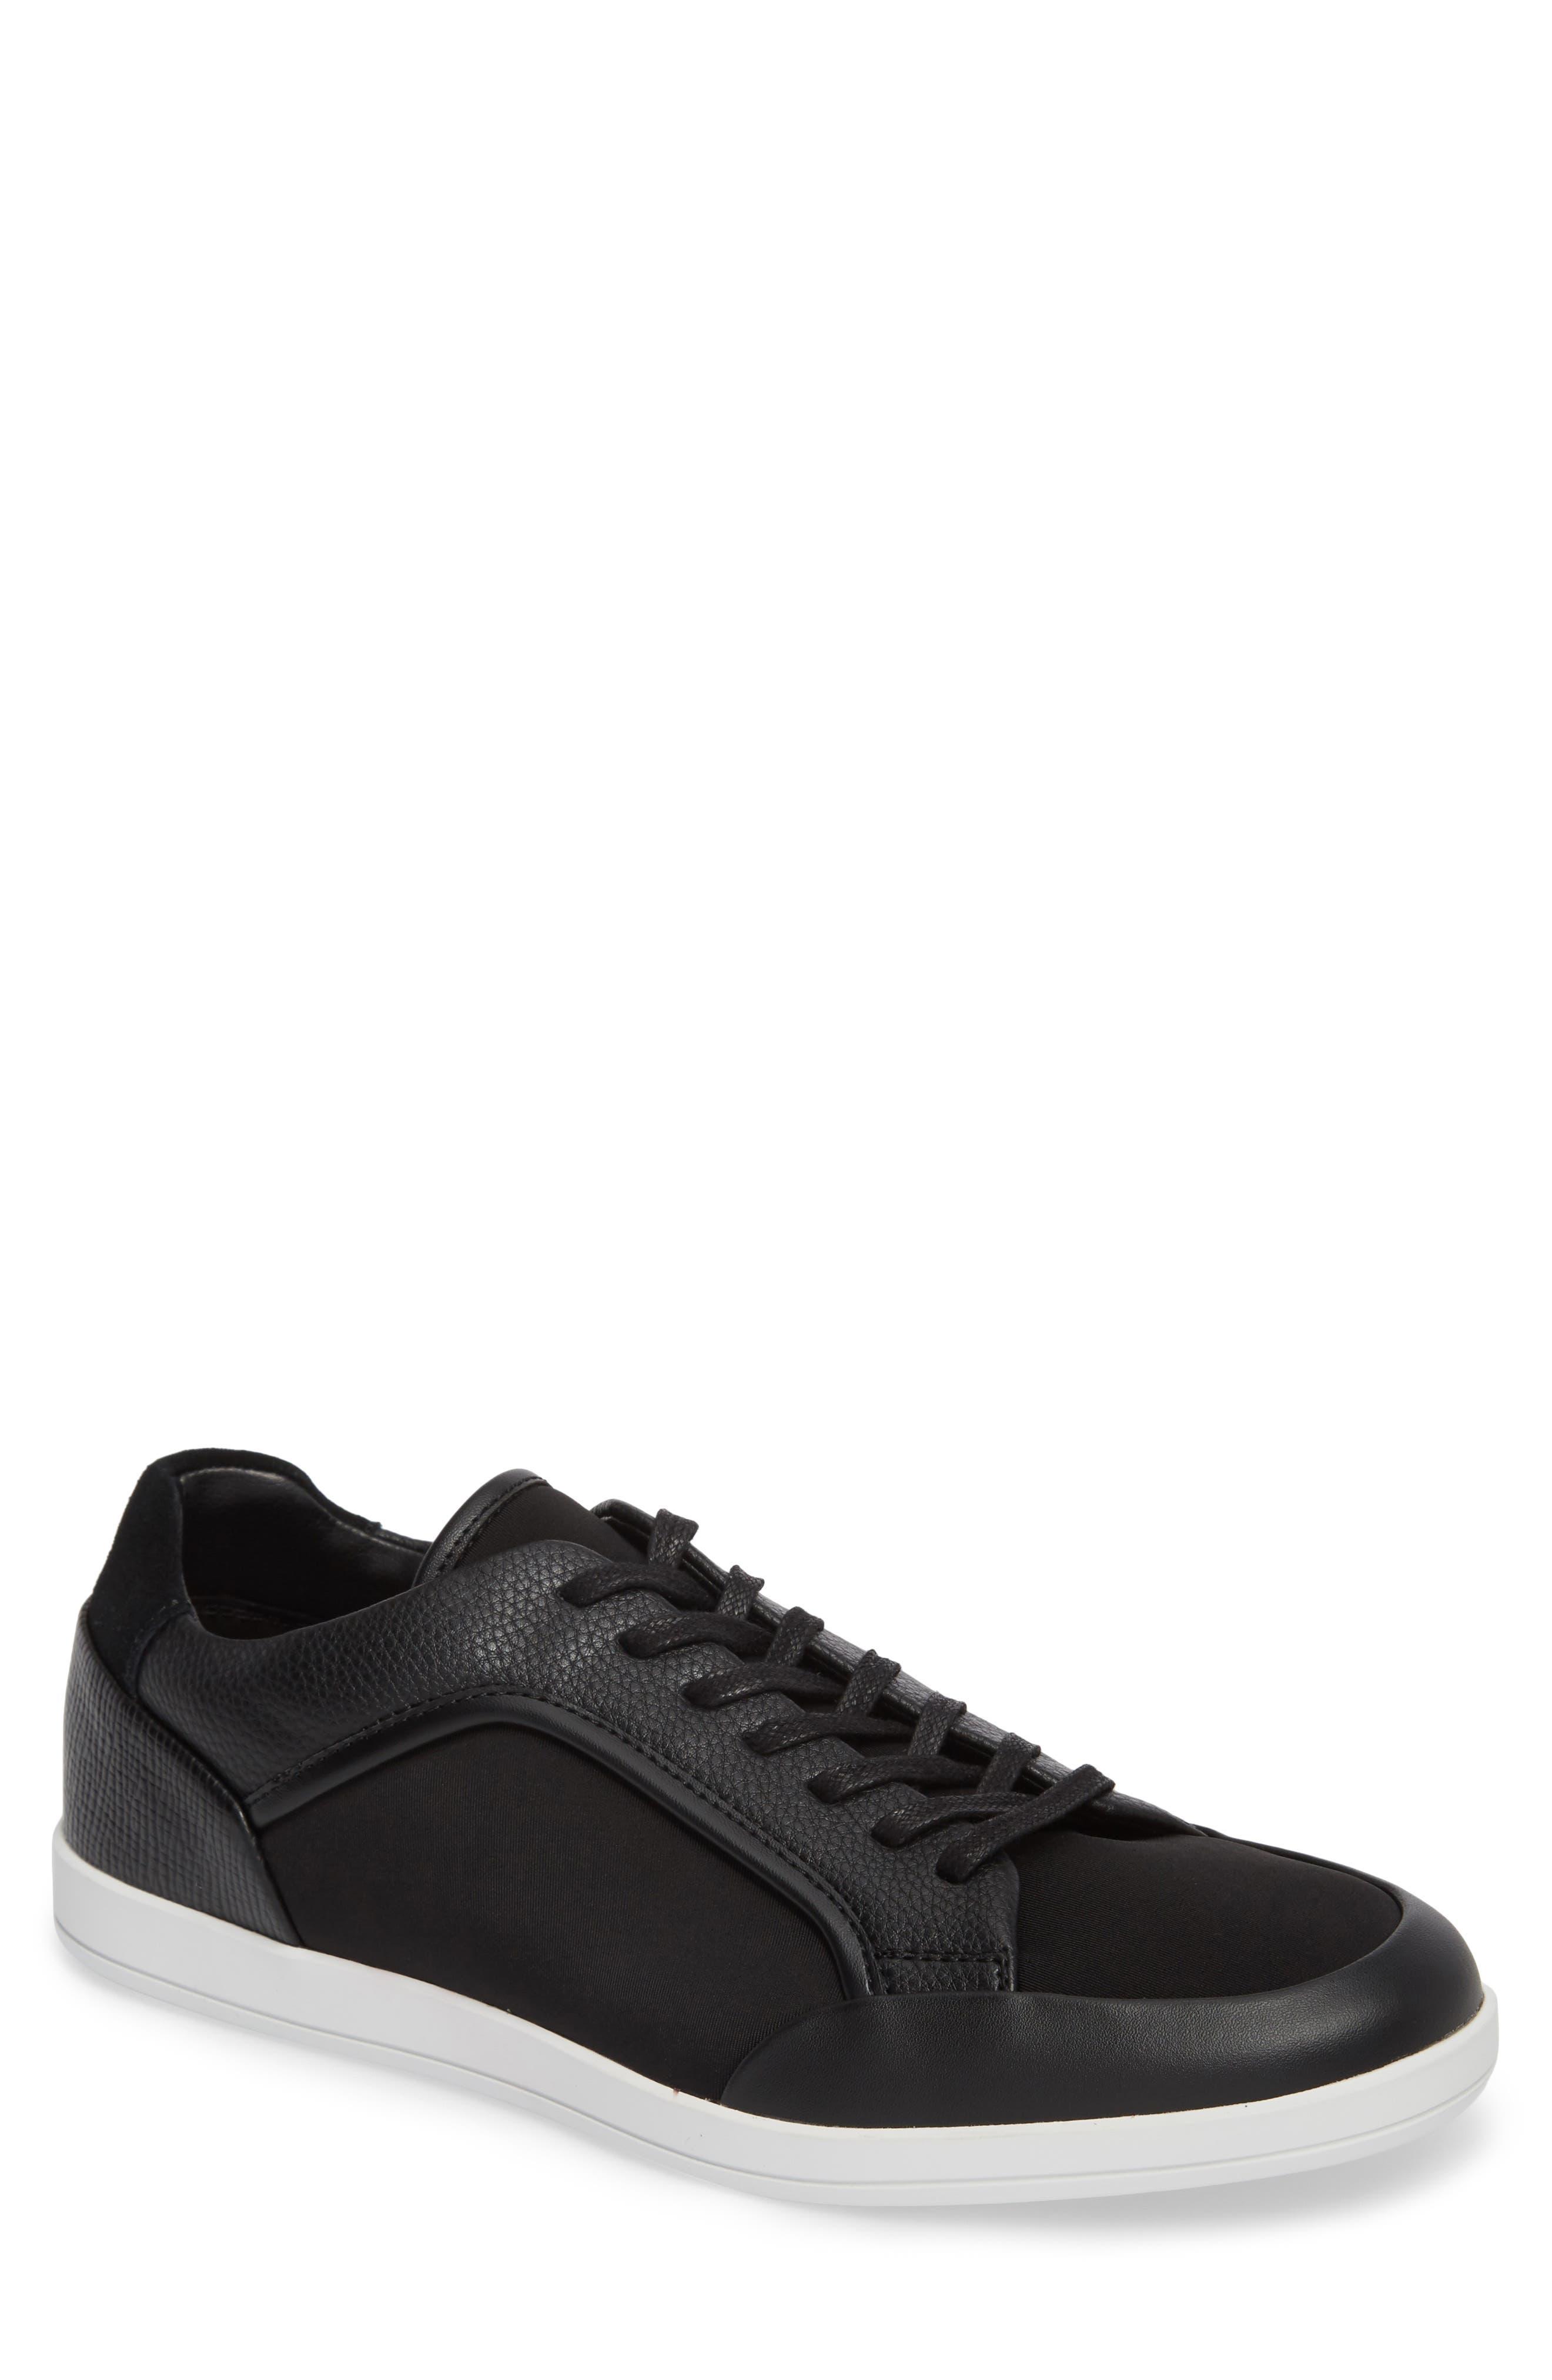 Masen Sneaker,                             Main thumbnail 1, color,                             001